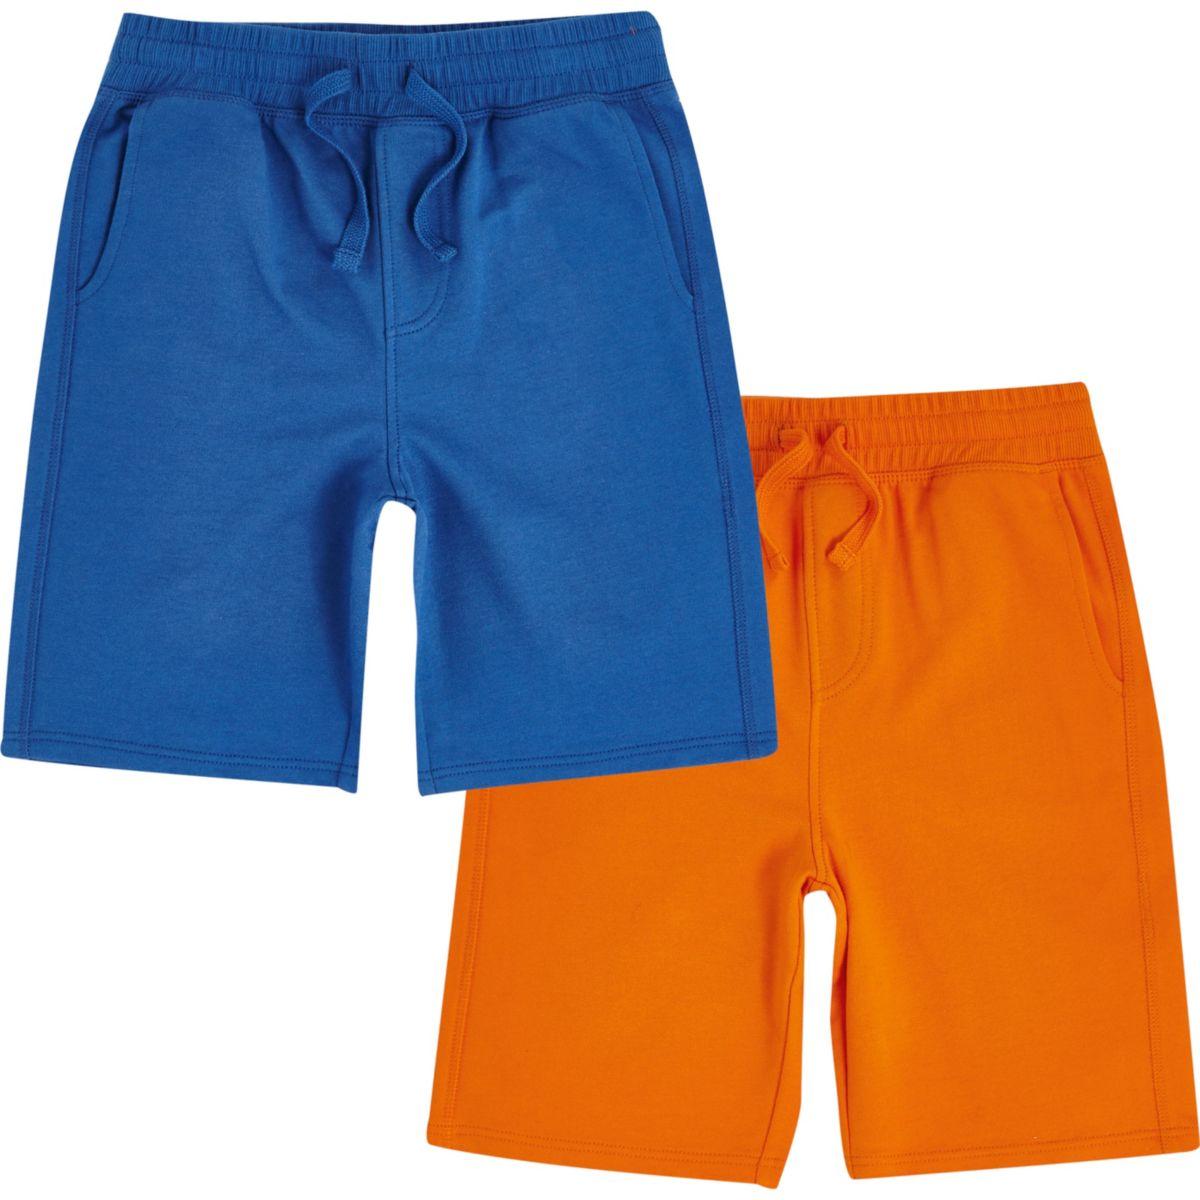 Boys blue and orange jersey shorts